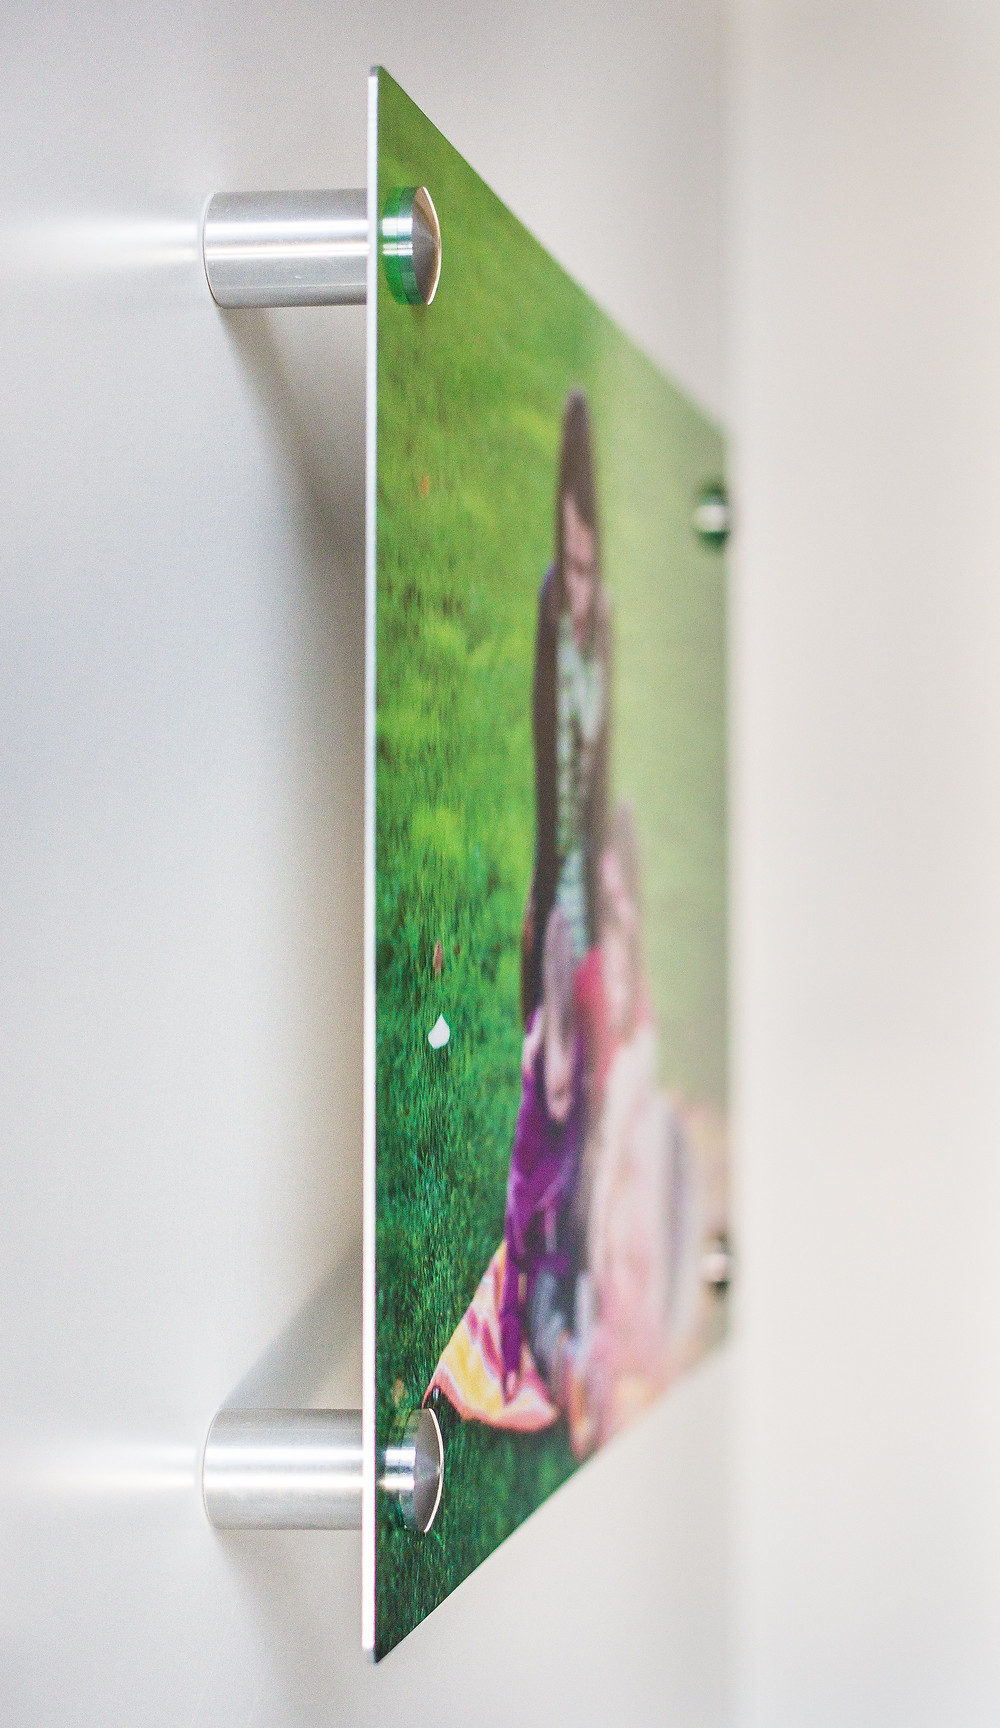 Photographic print on metal